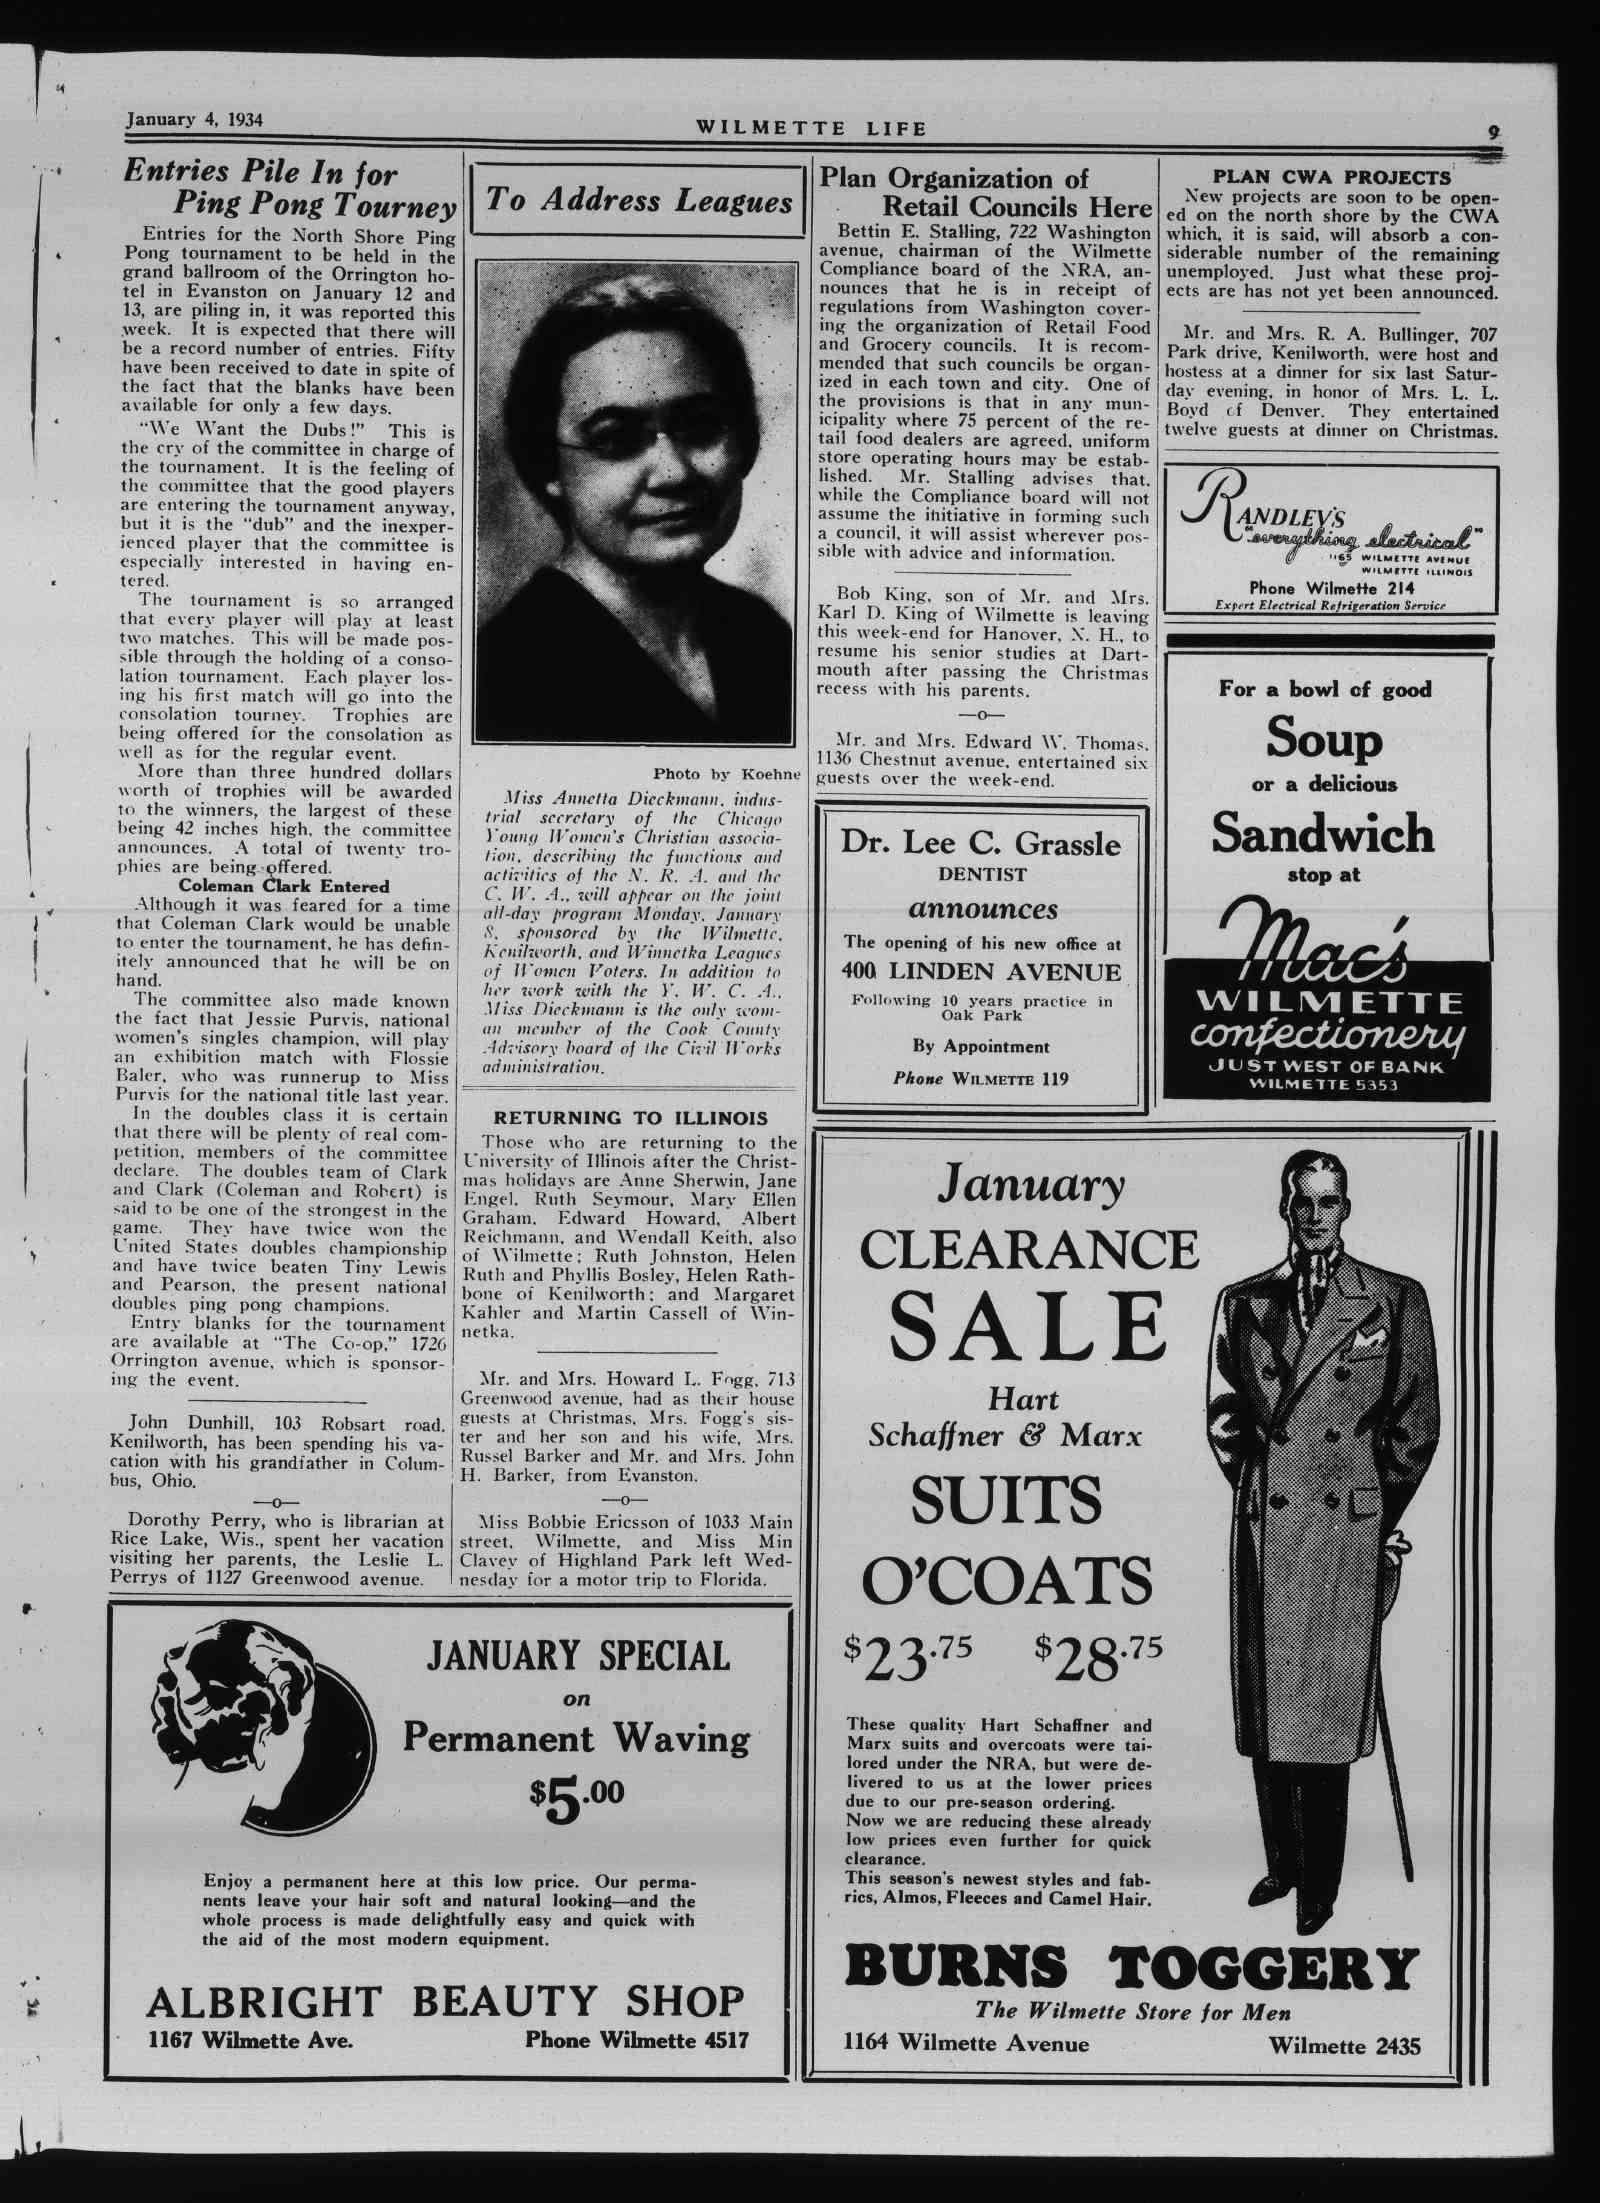 Wilmette Life (Wilmette, Illinois), 4 Jan 1934